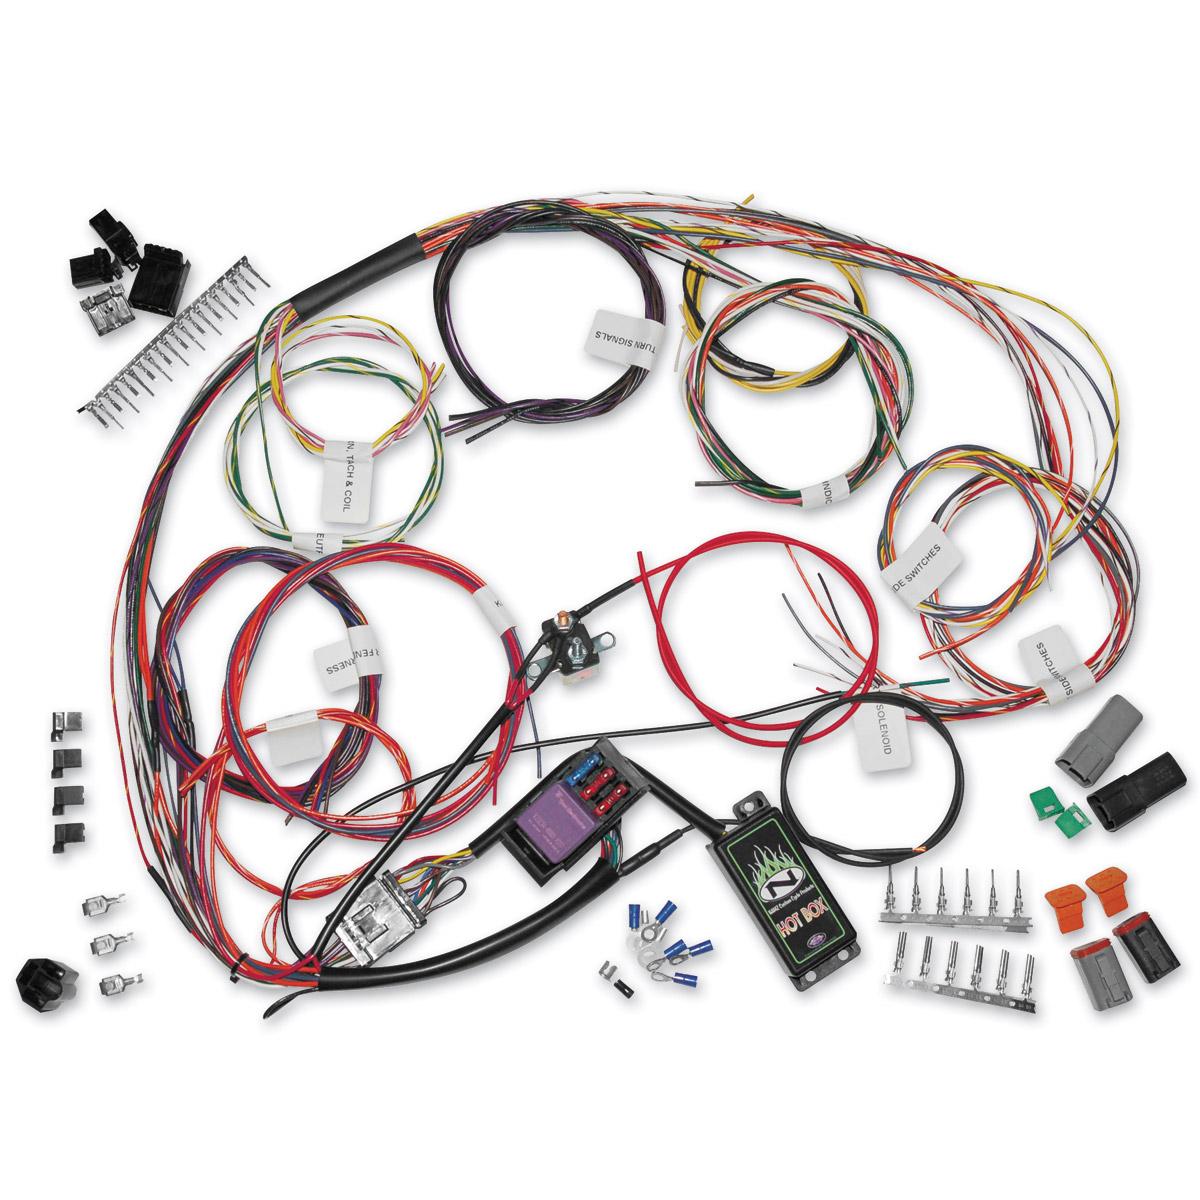 NAMZ Custom Cycle Complete Bike Wiring Harness Kit 745 072 J&P